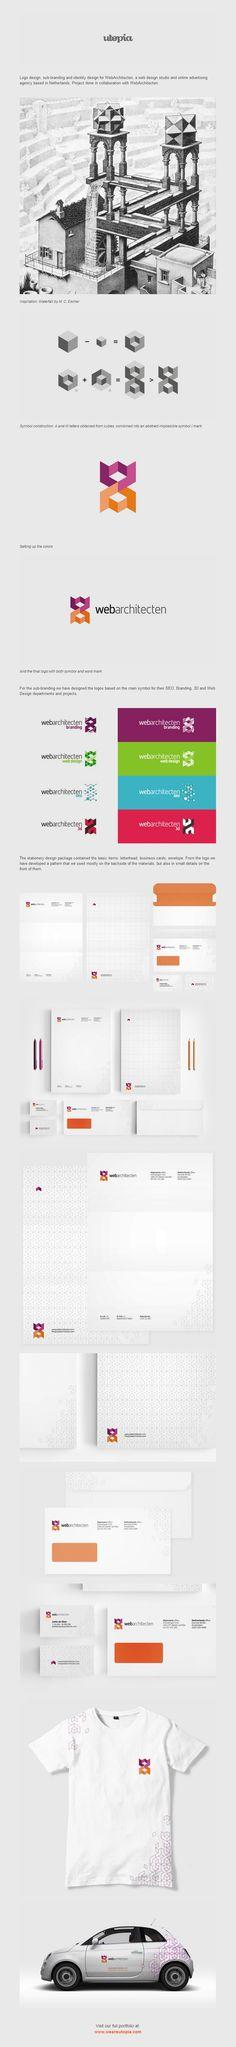 Logo design, sub-branding and identity design for WebArchitecten, a web design studio and online advertising agency based in Netherlands.